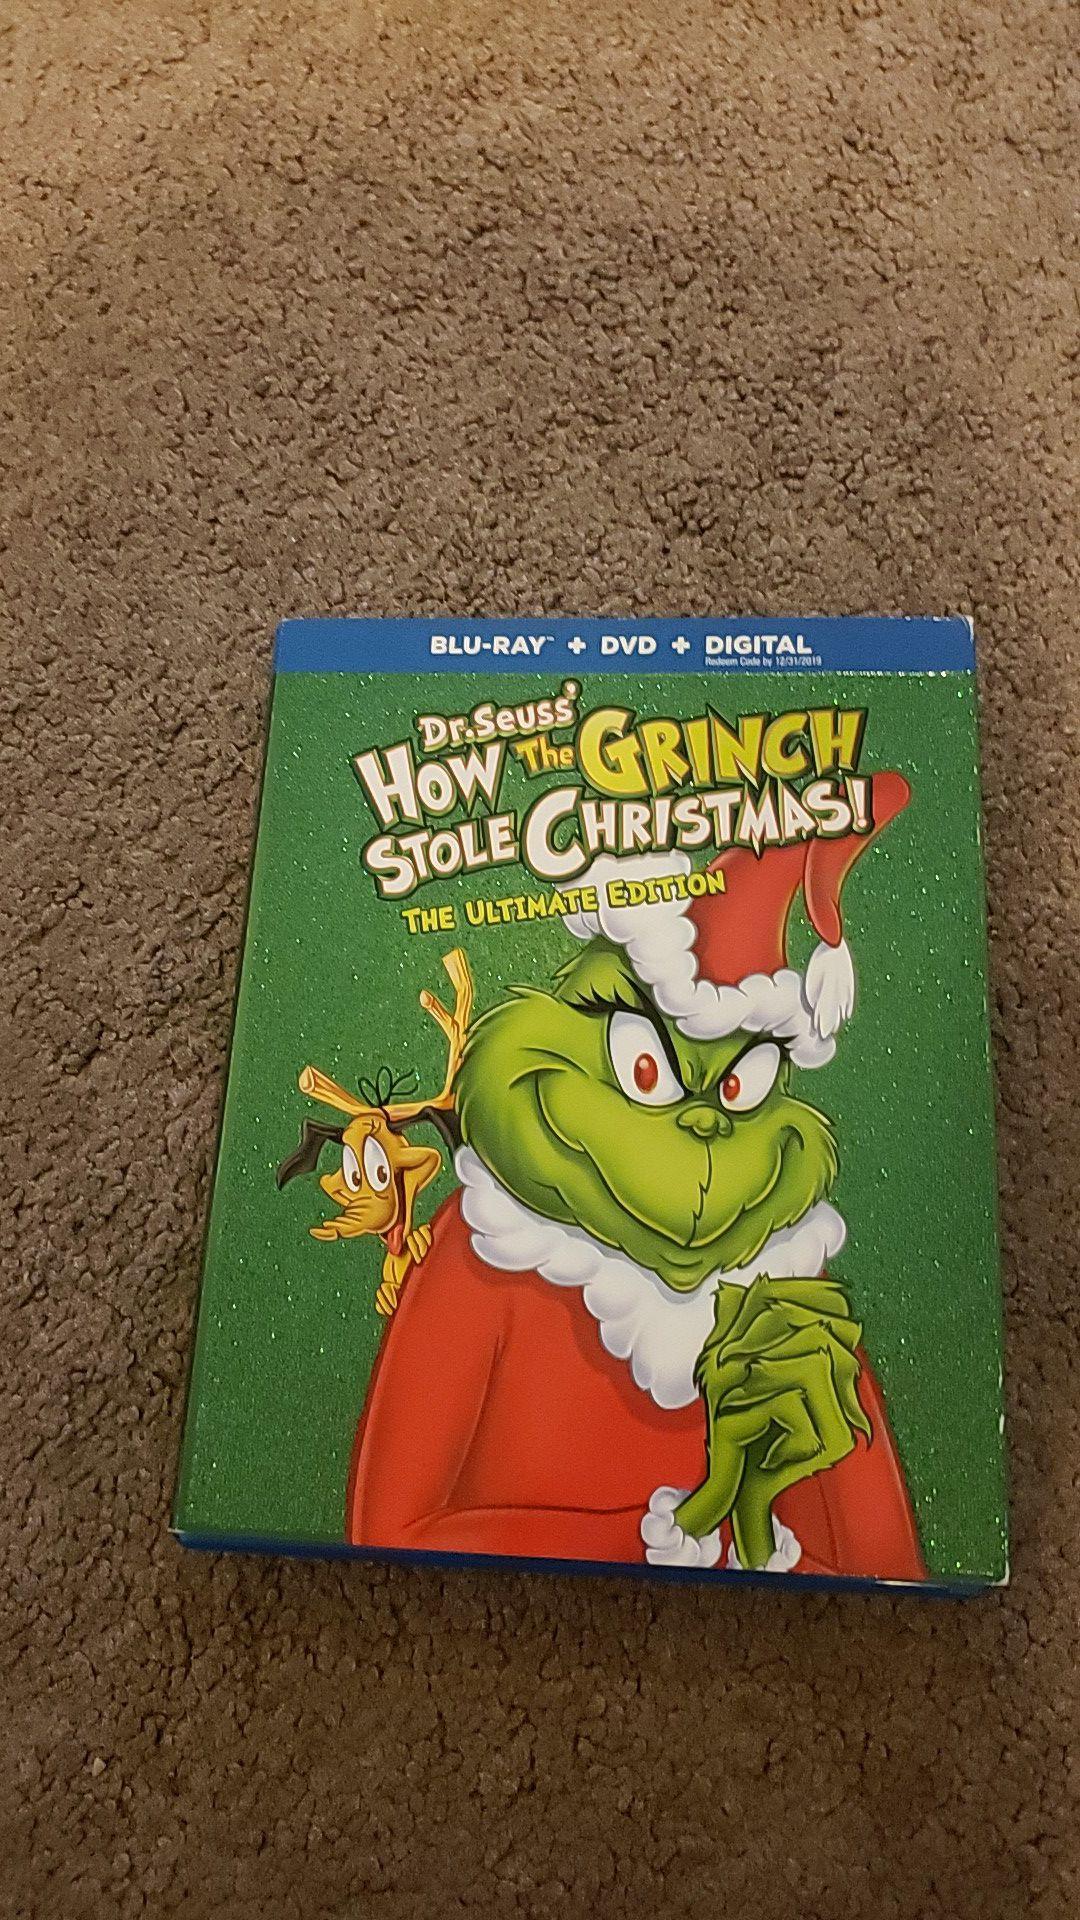 The Grinch 1967 Blu-Ray